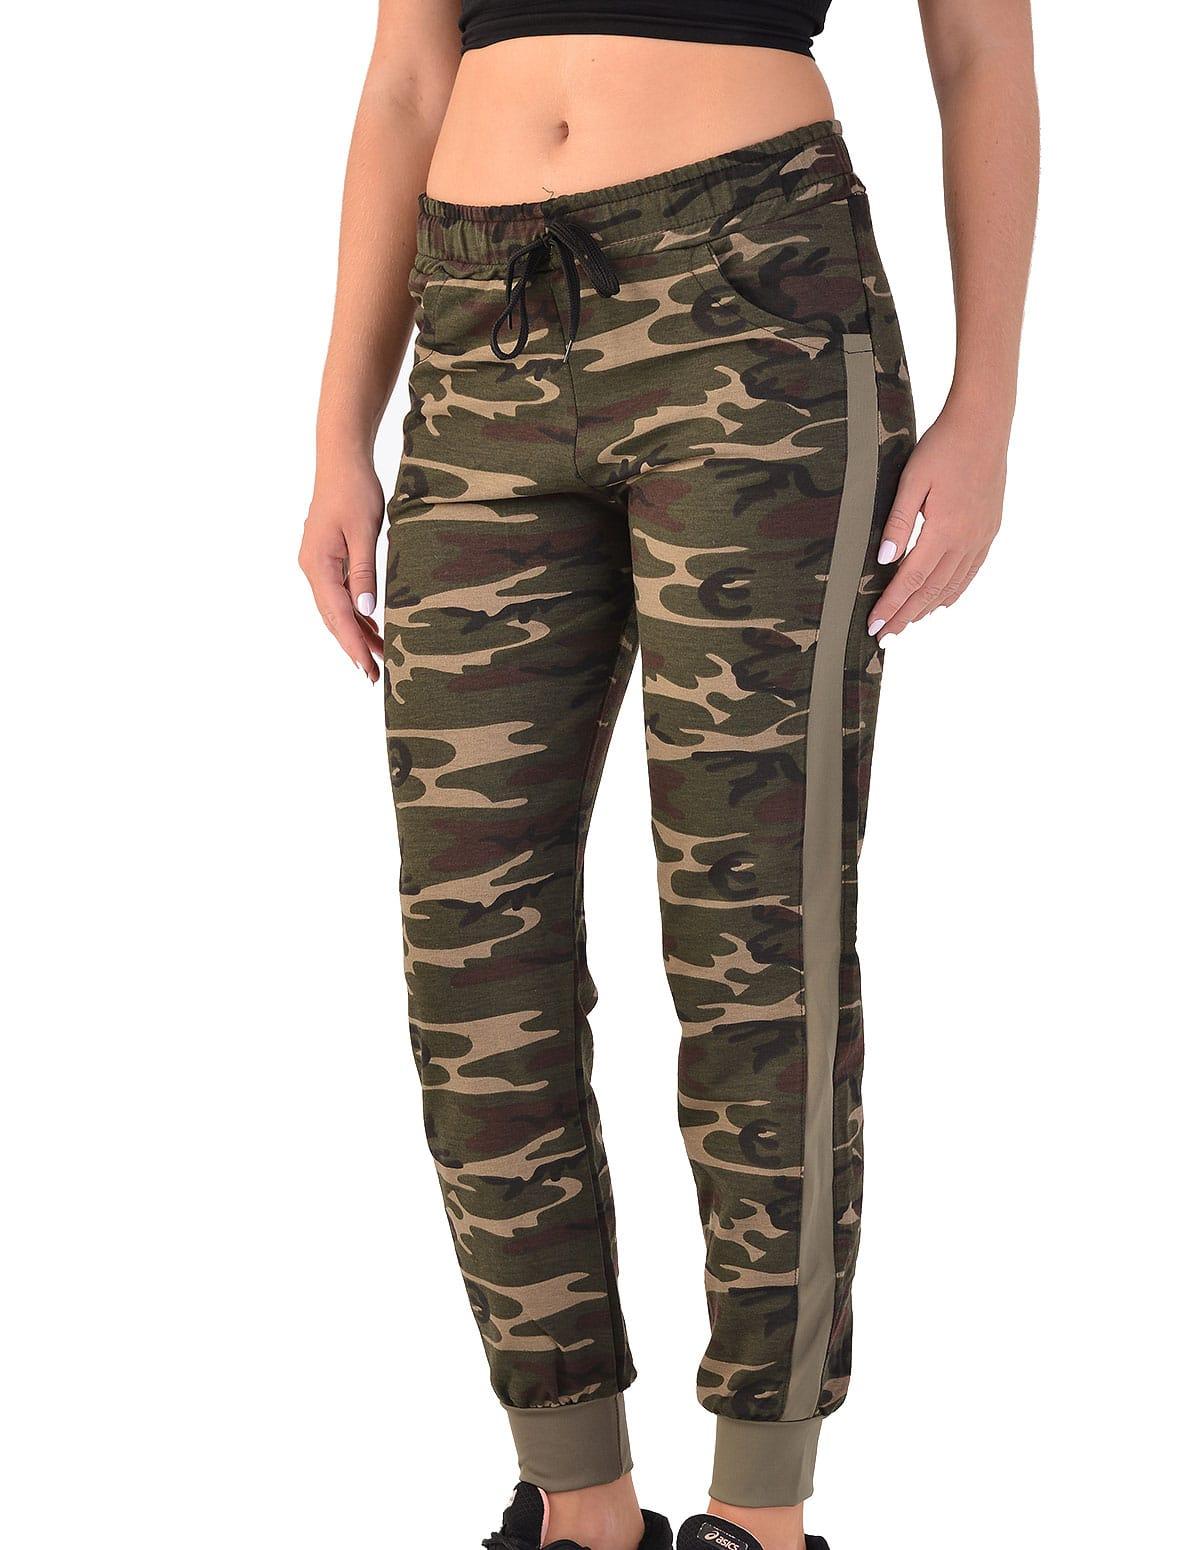 c6154557bb19 Γυναικείο παντελόνι φόρμας με λάστιχο στο πόδι παραλλαγής - vactive.gr